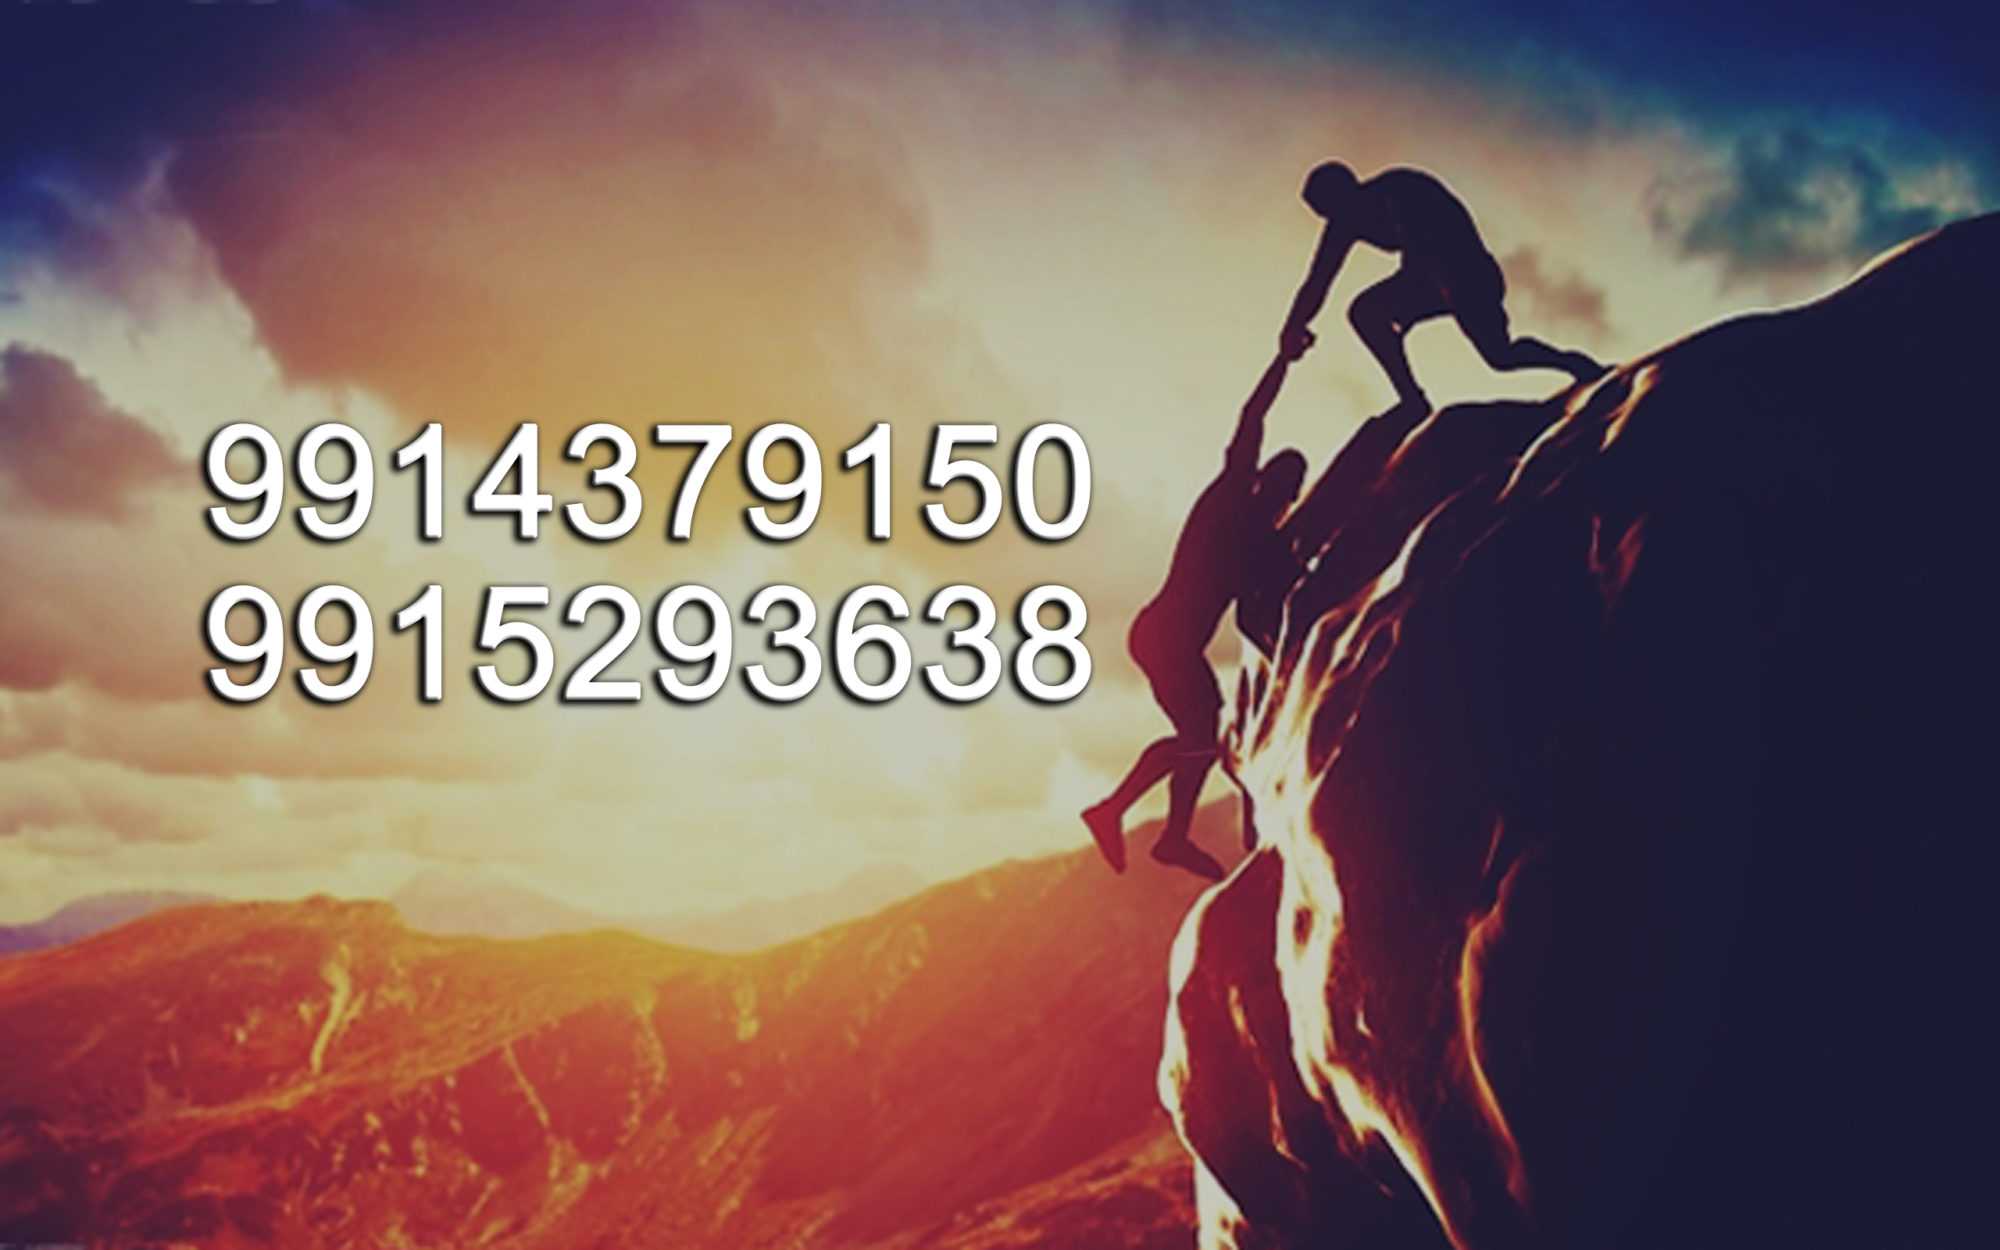 9914379150, 9915293638 - deaddiction center in punjab